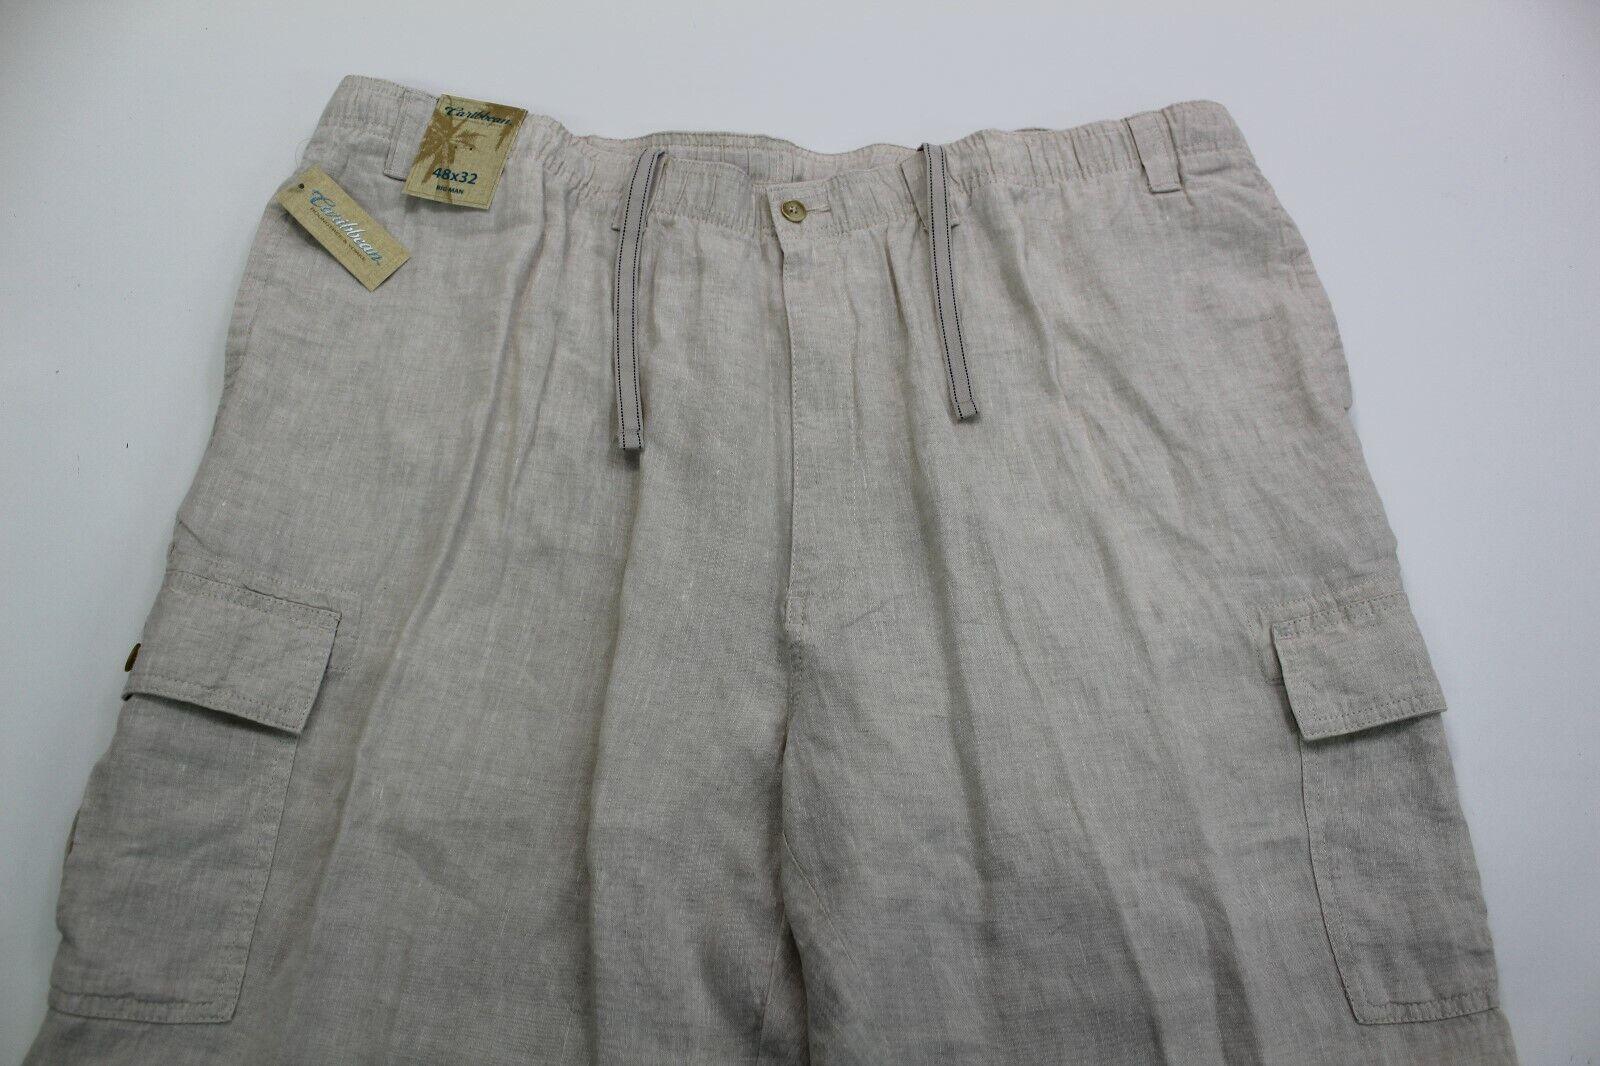 CARIBBEAN Men's 100% LINEN Cargo Pants 48x32 48 32 NWT Beach Wear